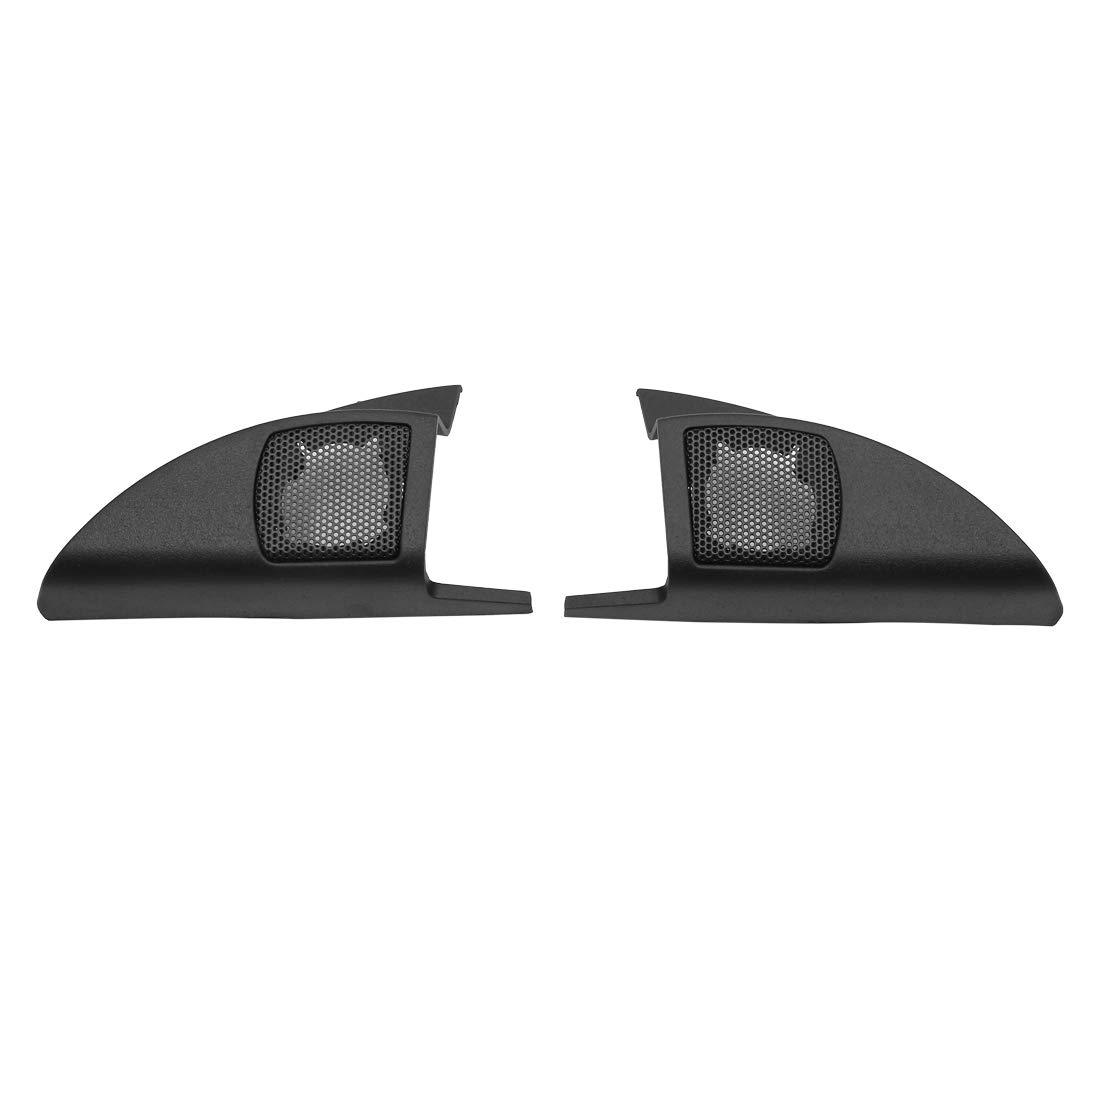 uxcell Pair Black Car Speaker Trim Cover Tweeter Protector for 2010 Honda City